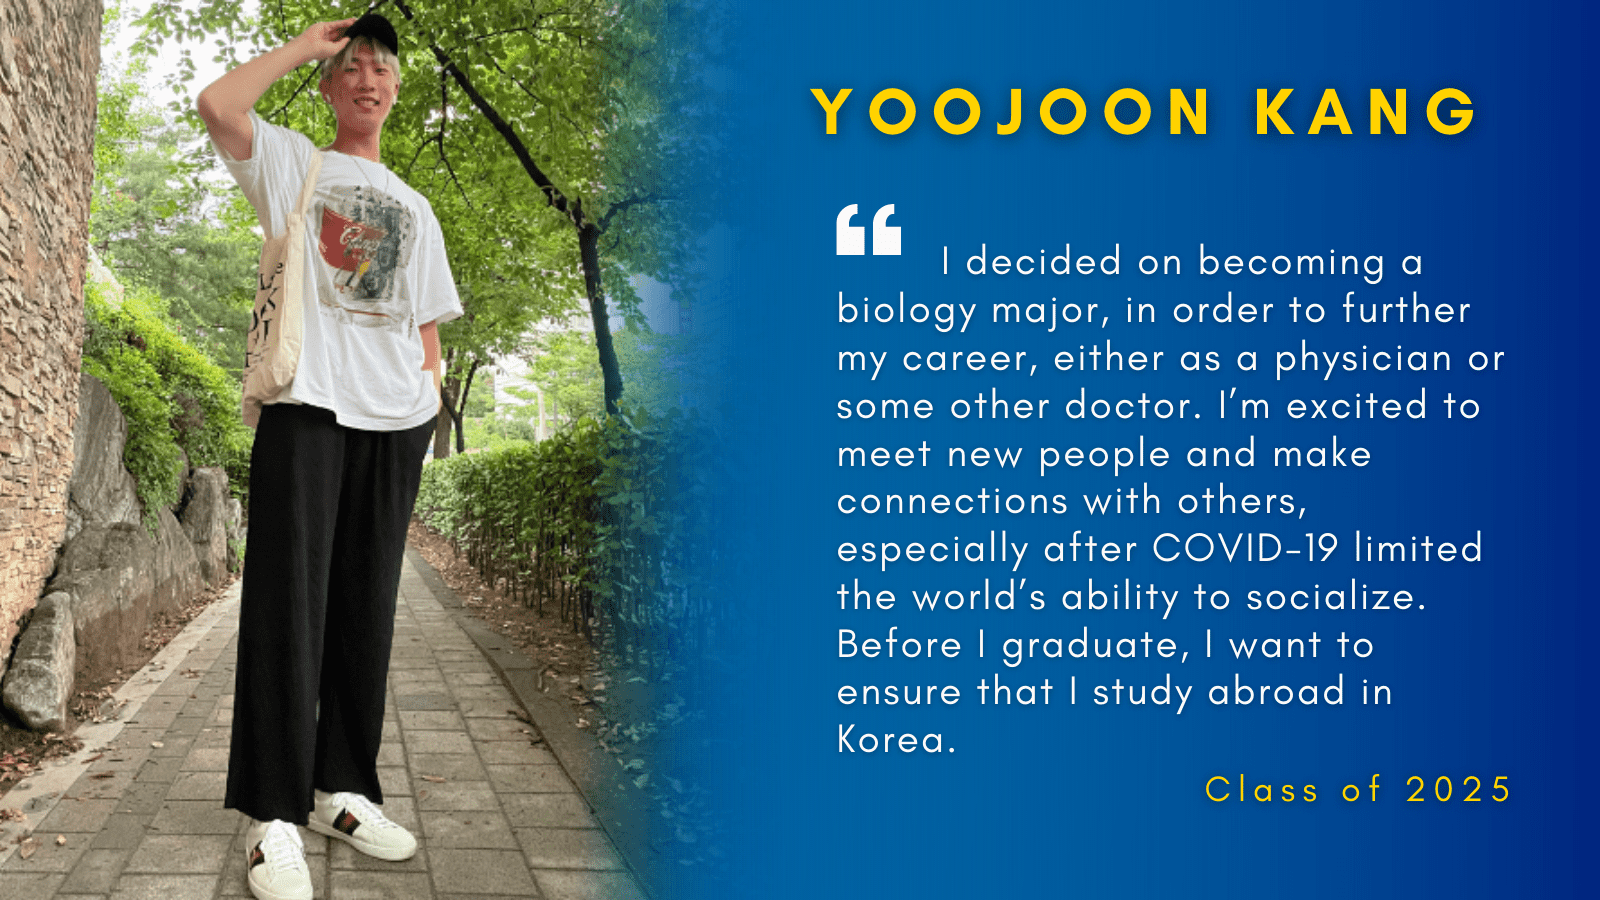 Image of Yoojoon Kang with his quote.